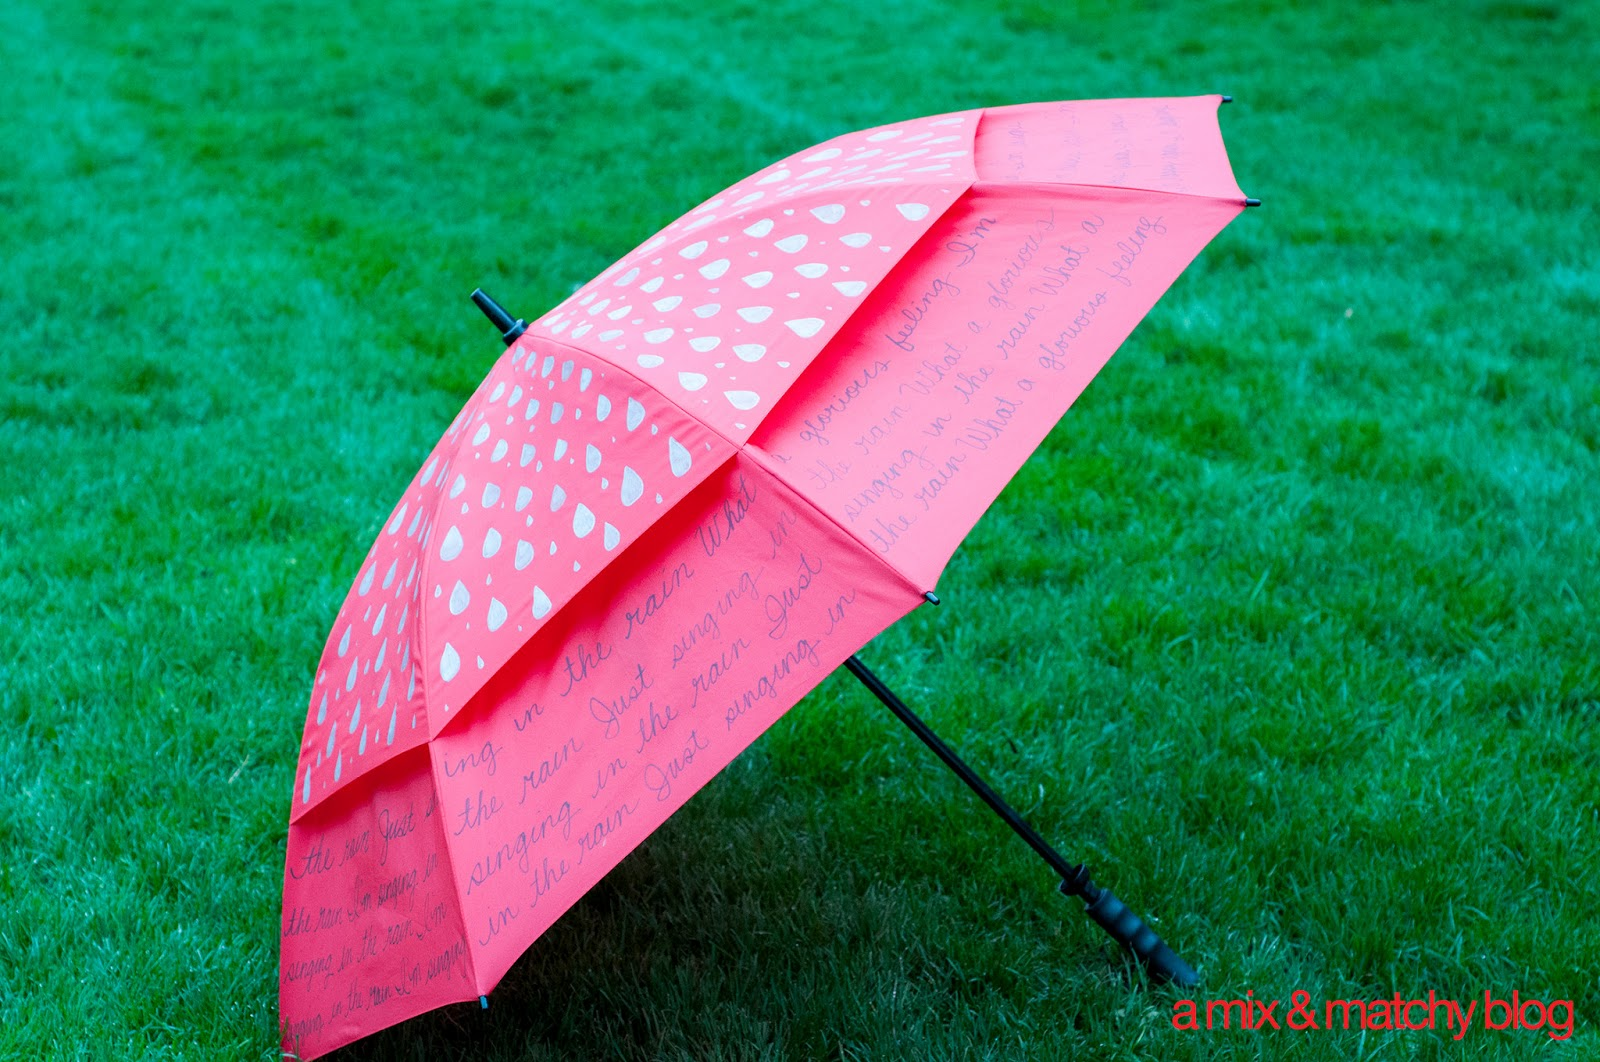 a mix & matchy blog: singing in the rain umbrella